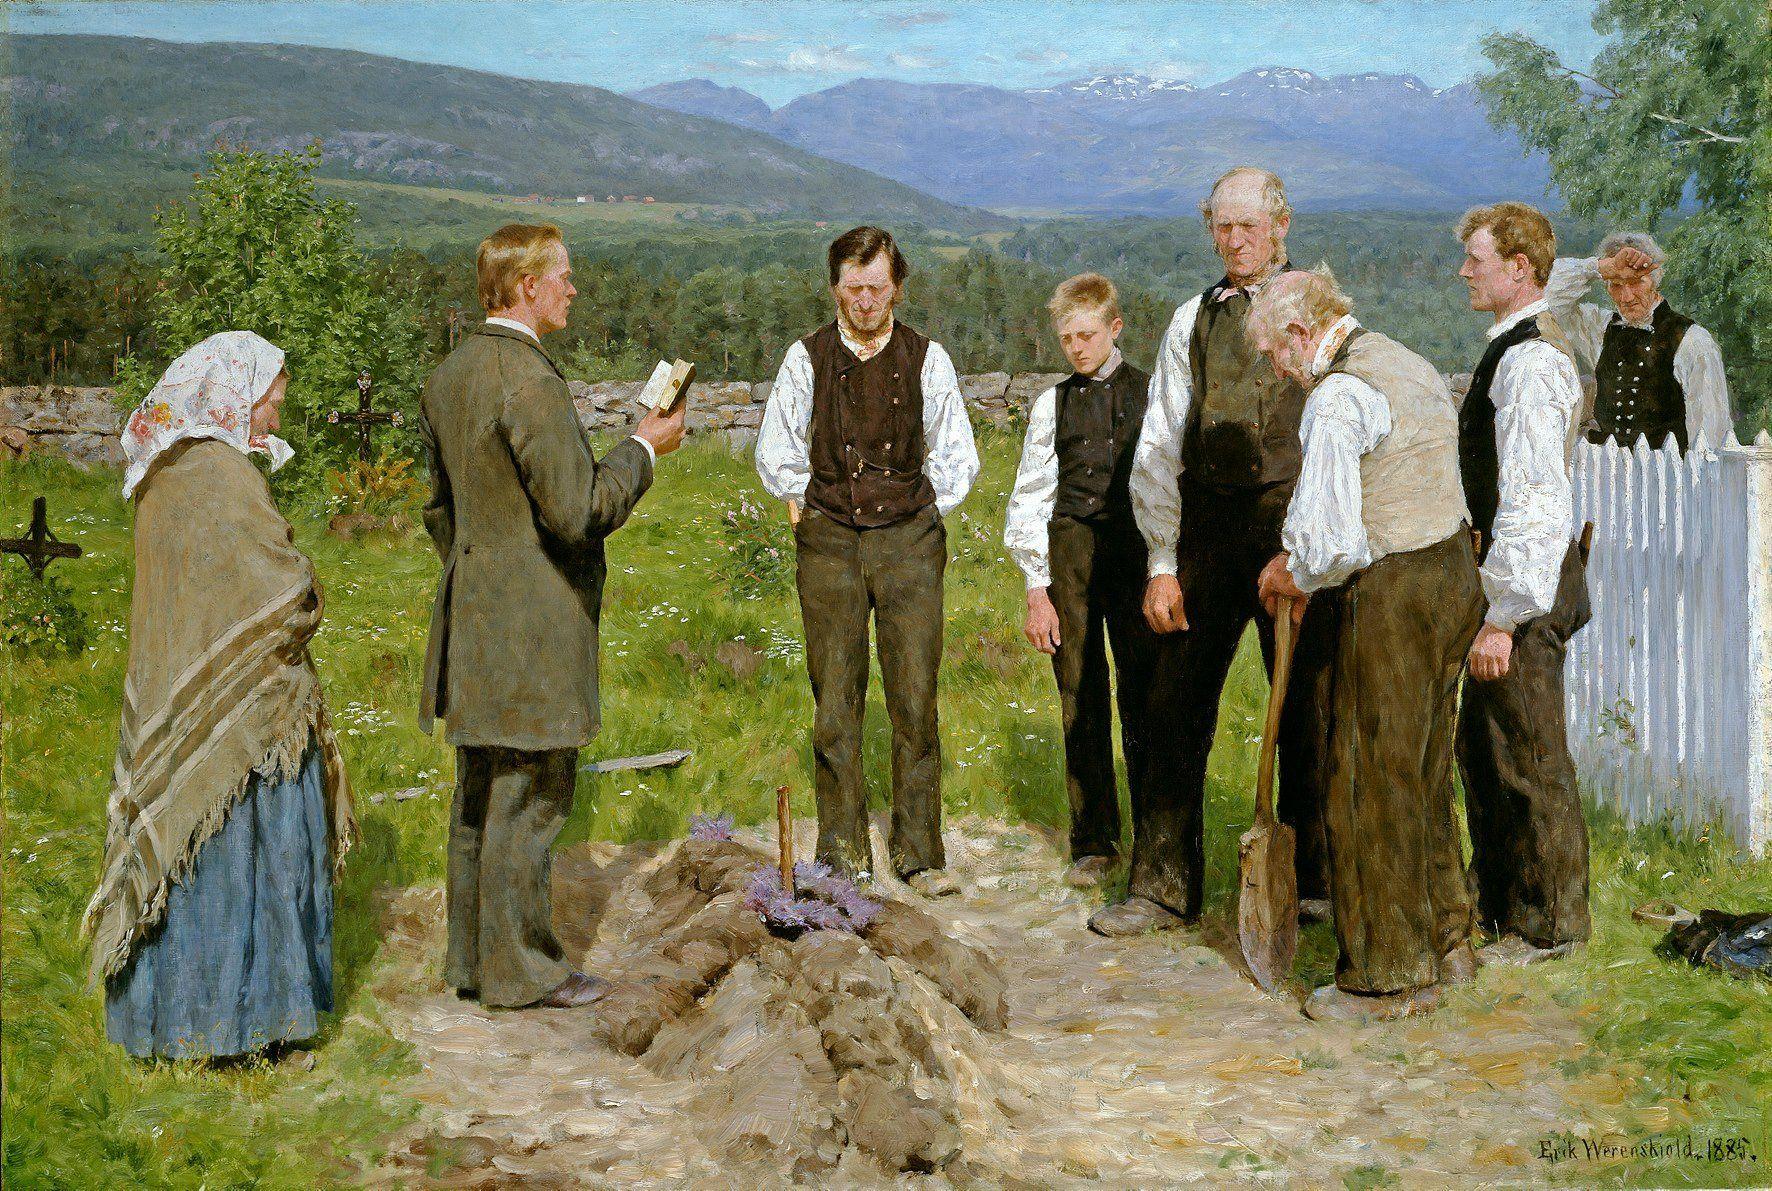 Erik Theodor Werenskiold (Norwegian painter) 1855 - 1936 En Bondebegravelse (Peasant Burial), 1885 oil on canvas 102.5 x 150.5 cm. Nasjonalgalleriet, Oslo, Norway